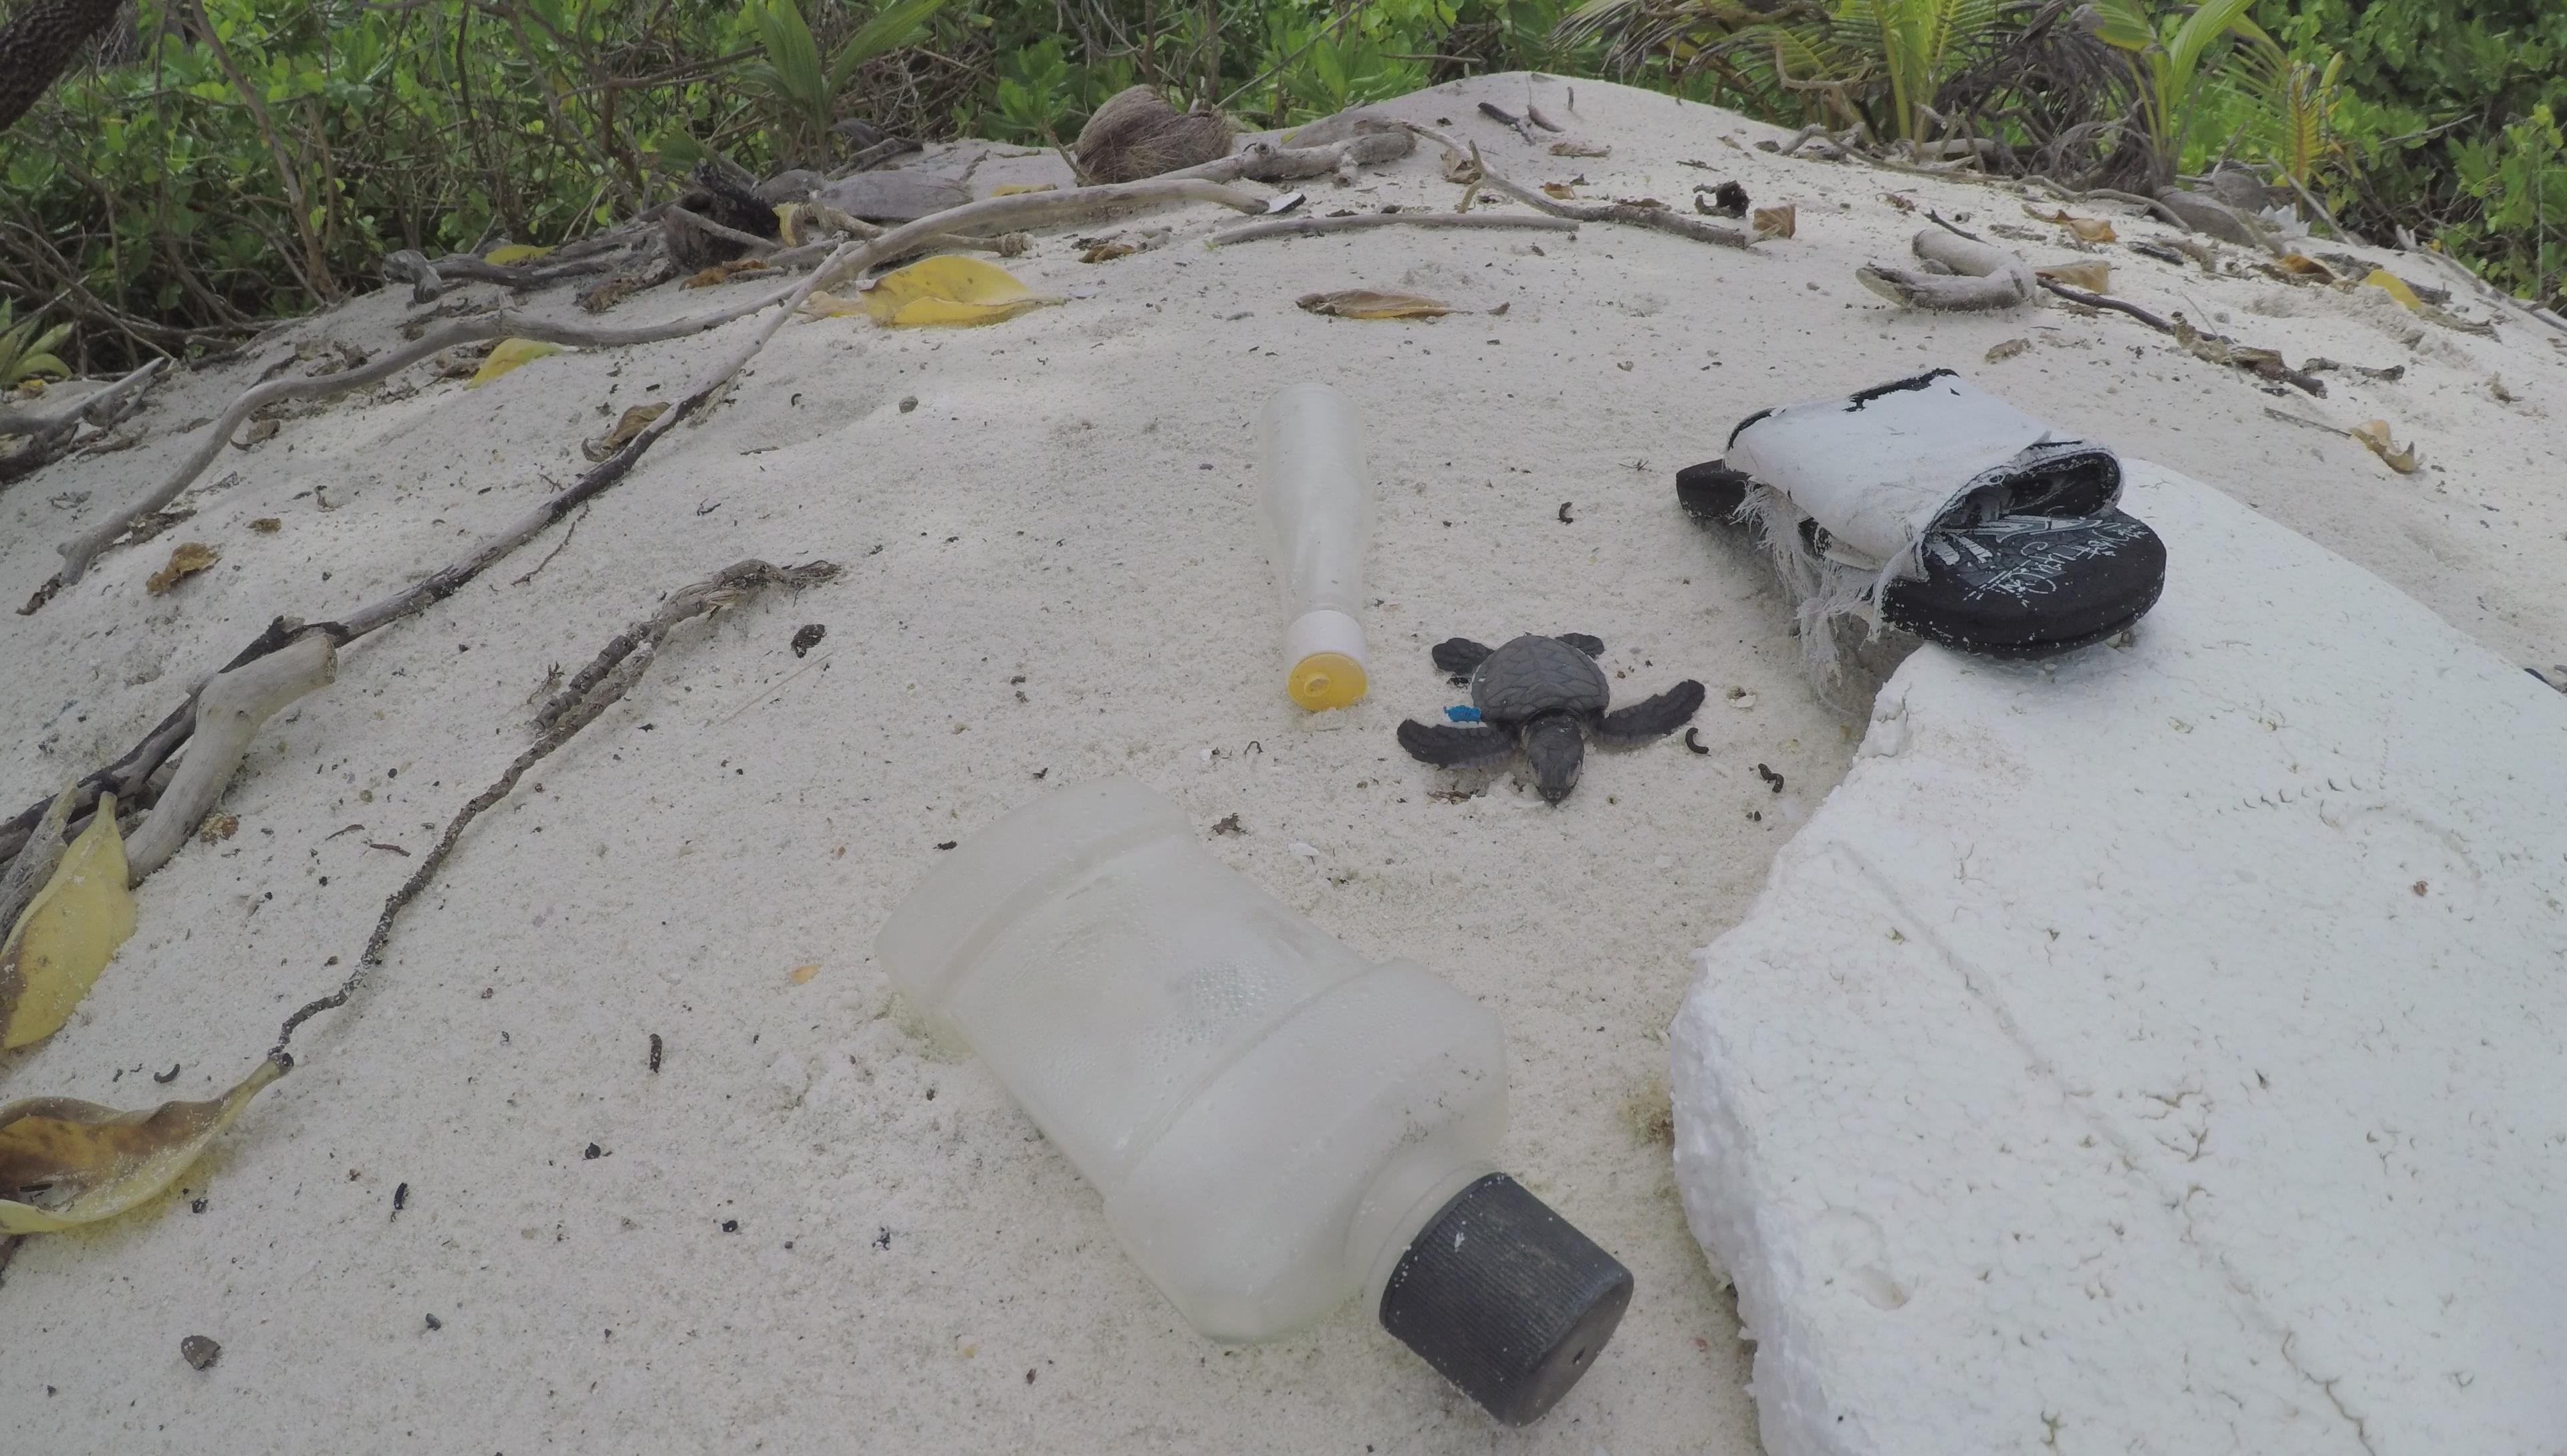 BIOT DPLUS090 Green turtle hatchling found amongst plastic waste on beach, Credit - Nicole Esteban